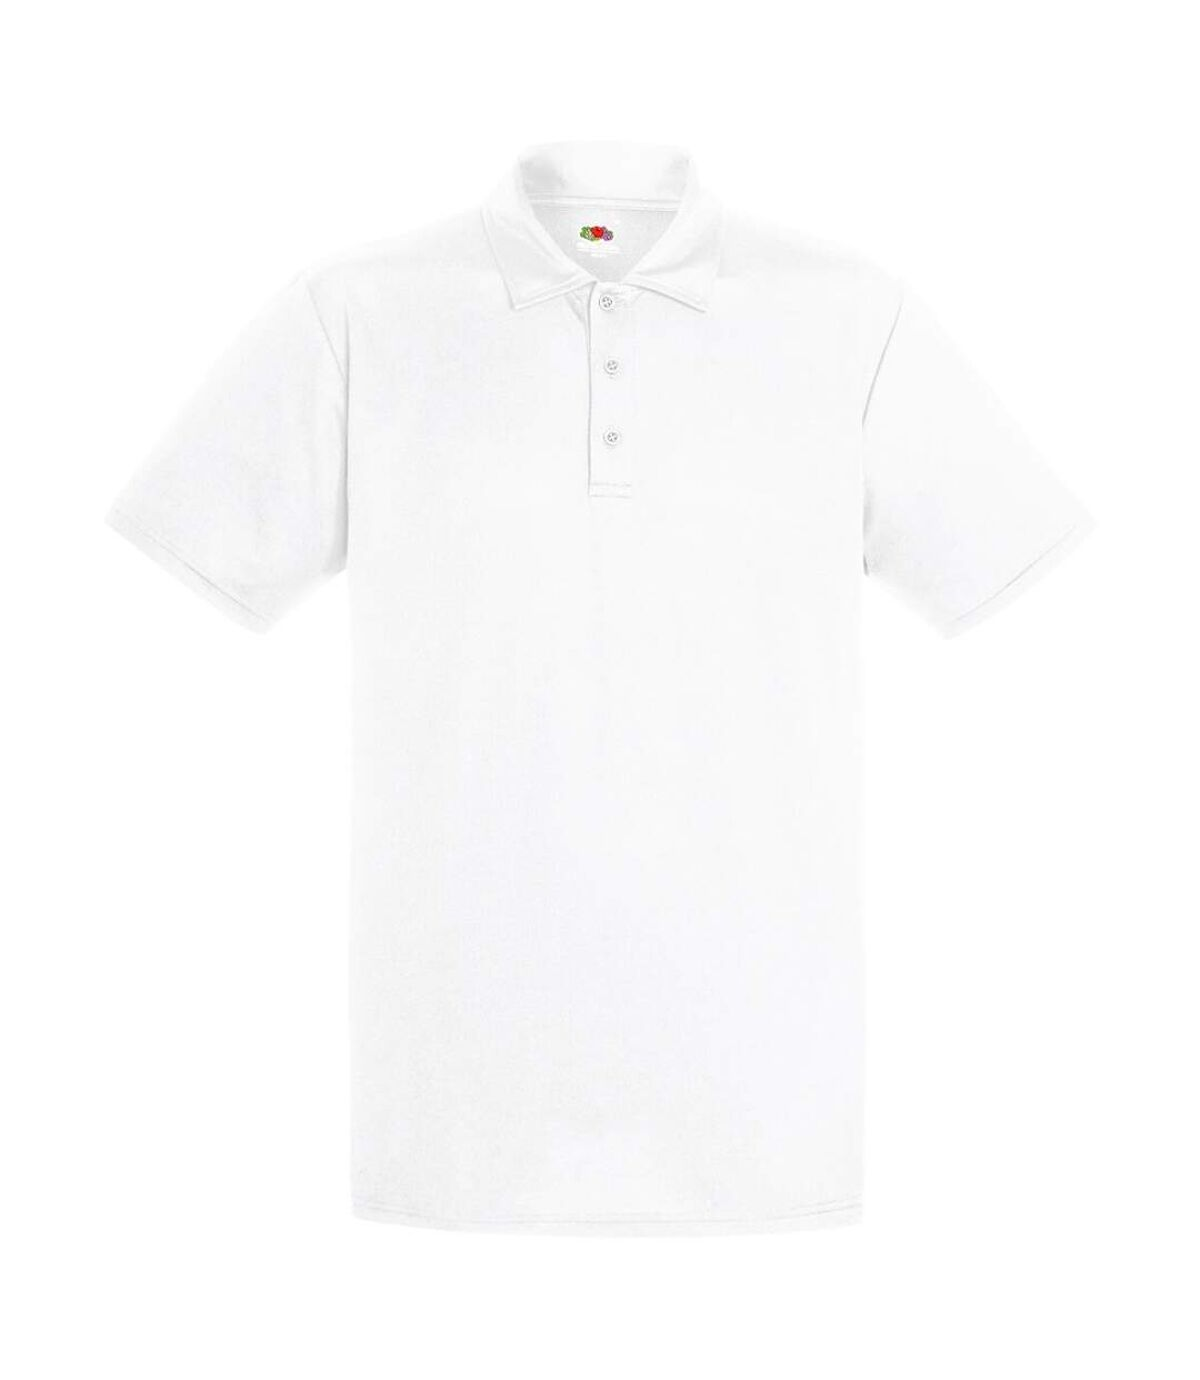 Fruit Of The Loom Mens Short Sleeve Moisture Wicking Performance Polo Shirt (White) - UTBC3479